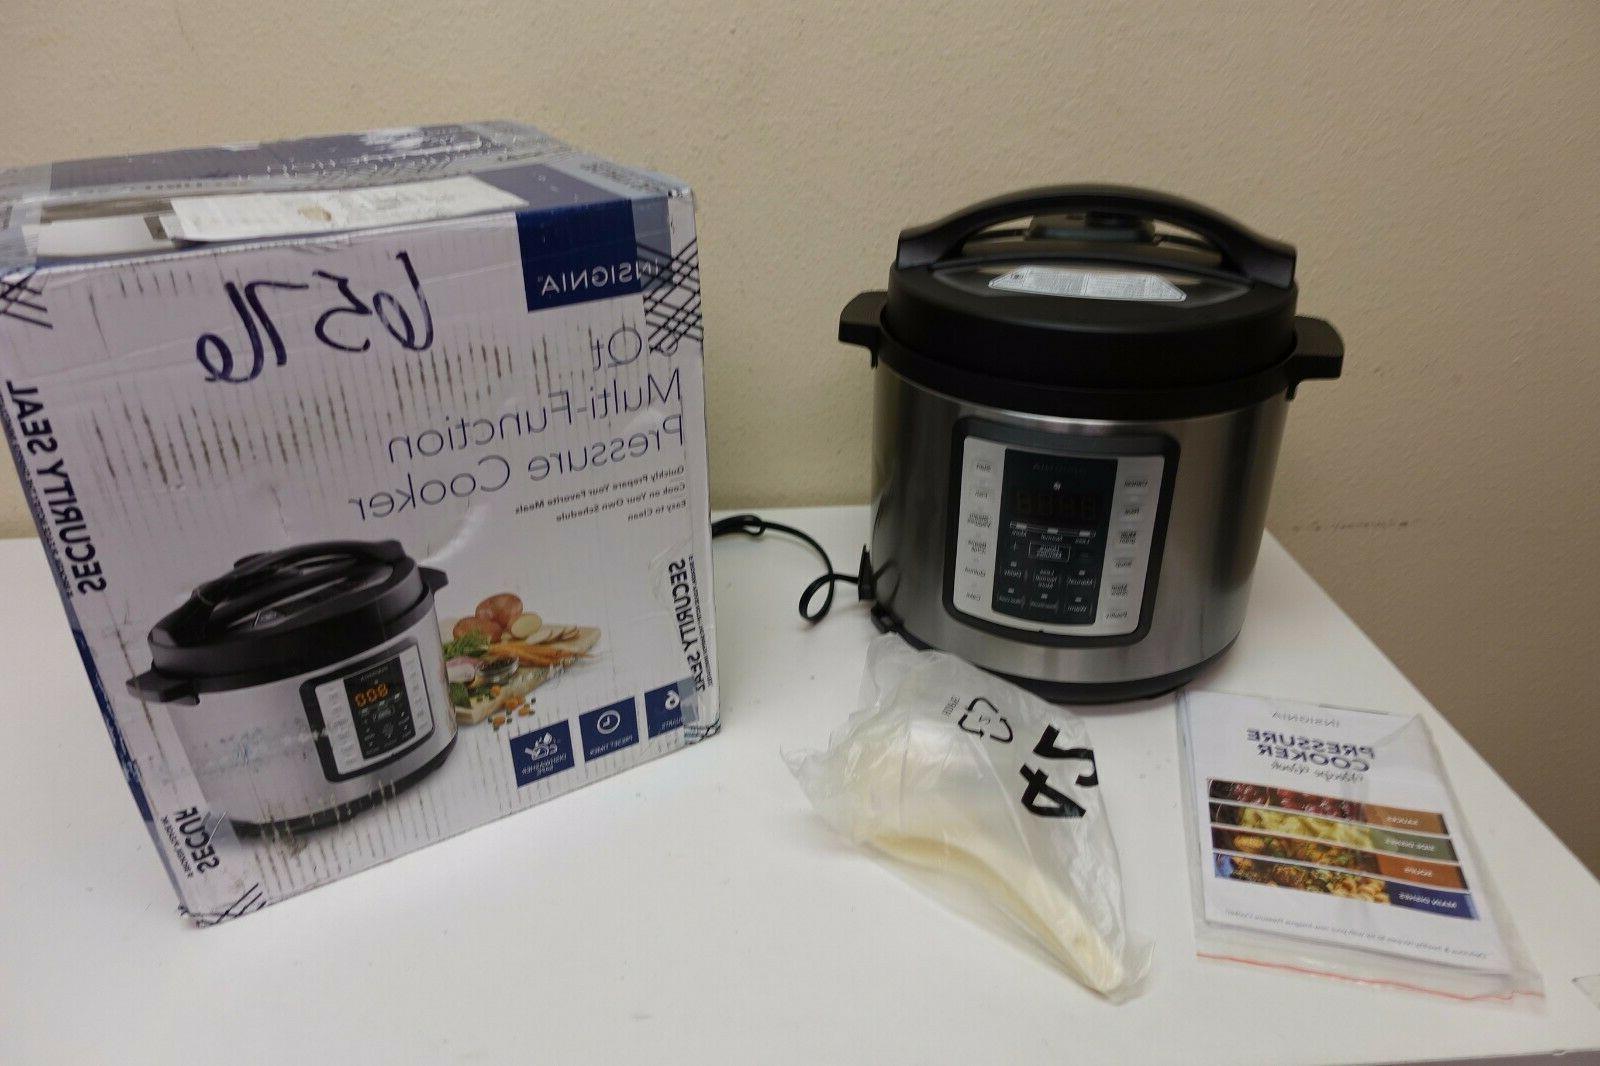 6 quart multi function pressure cooker stainless